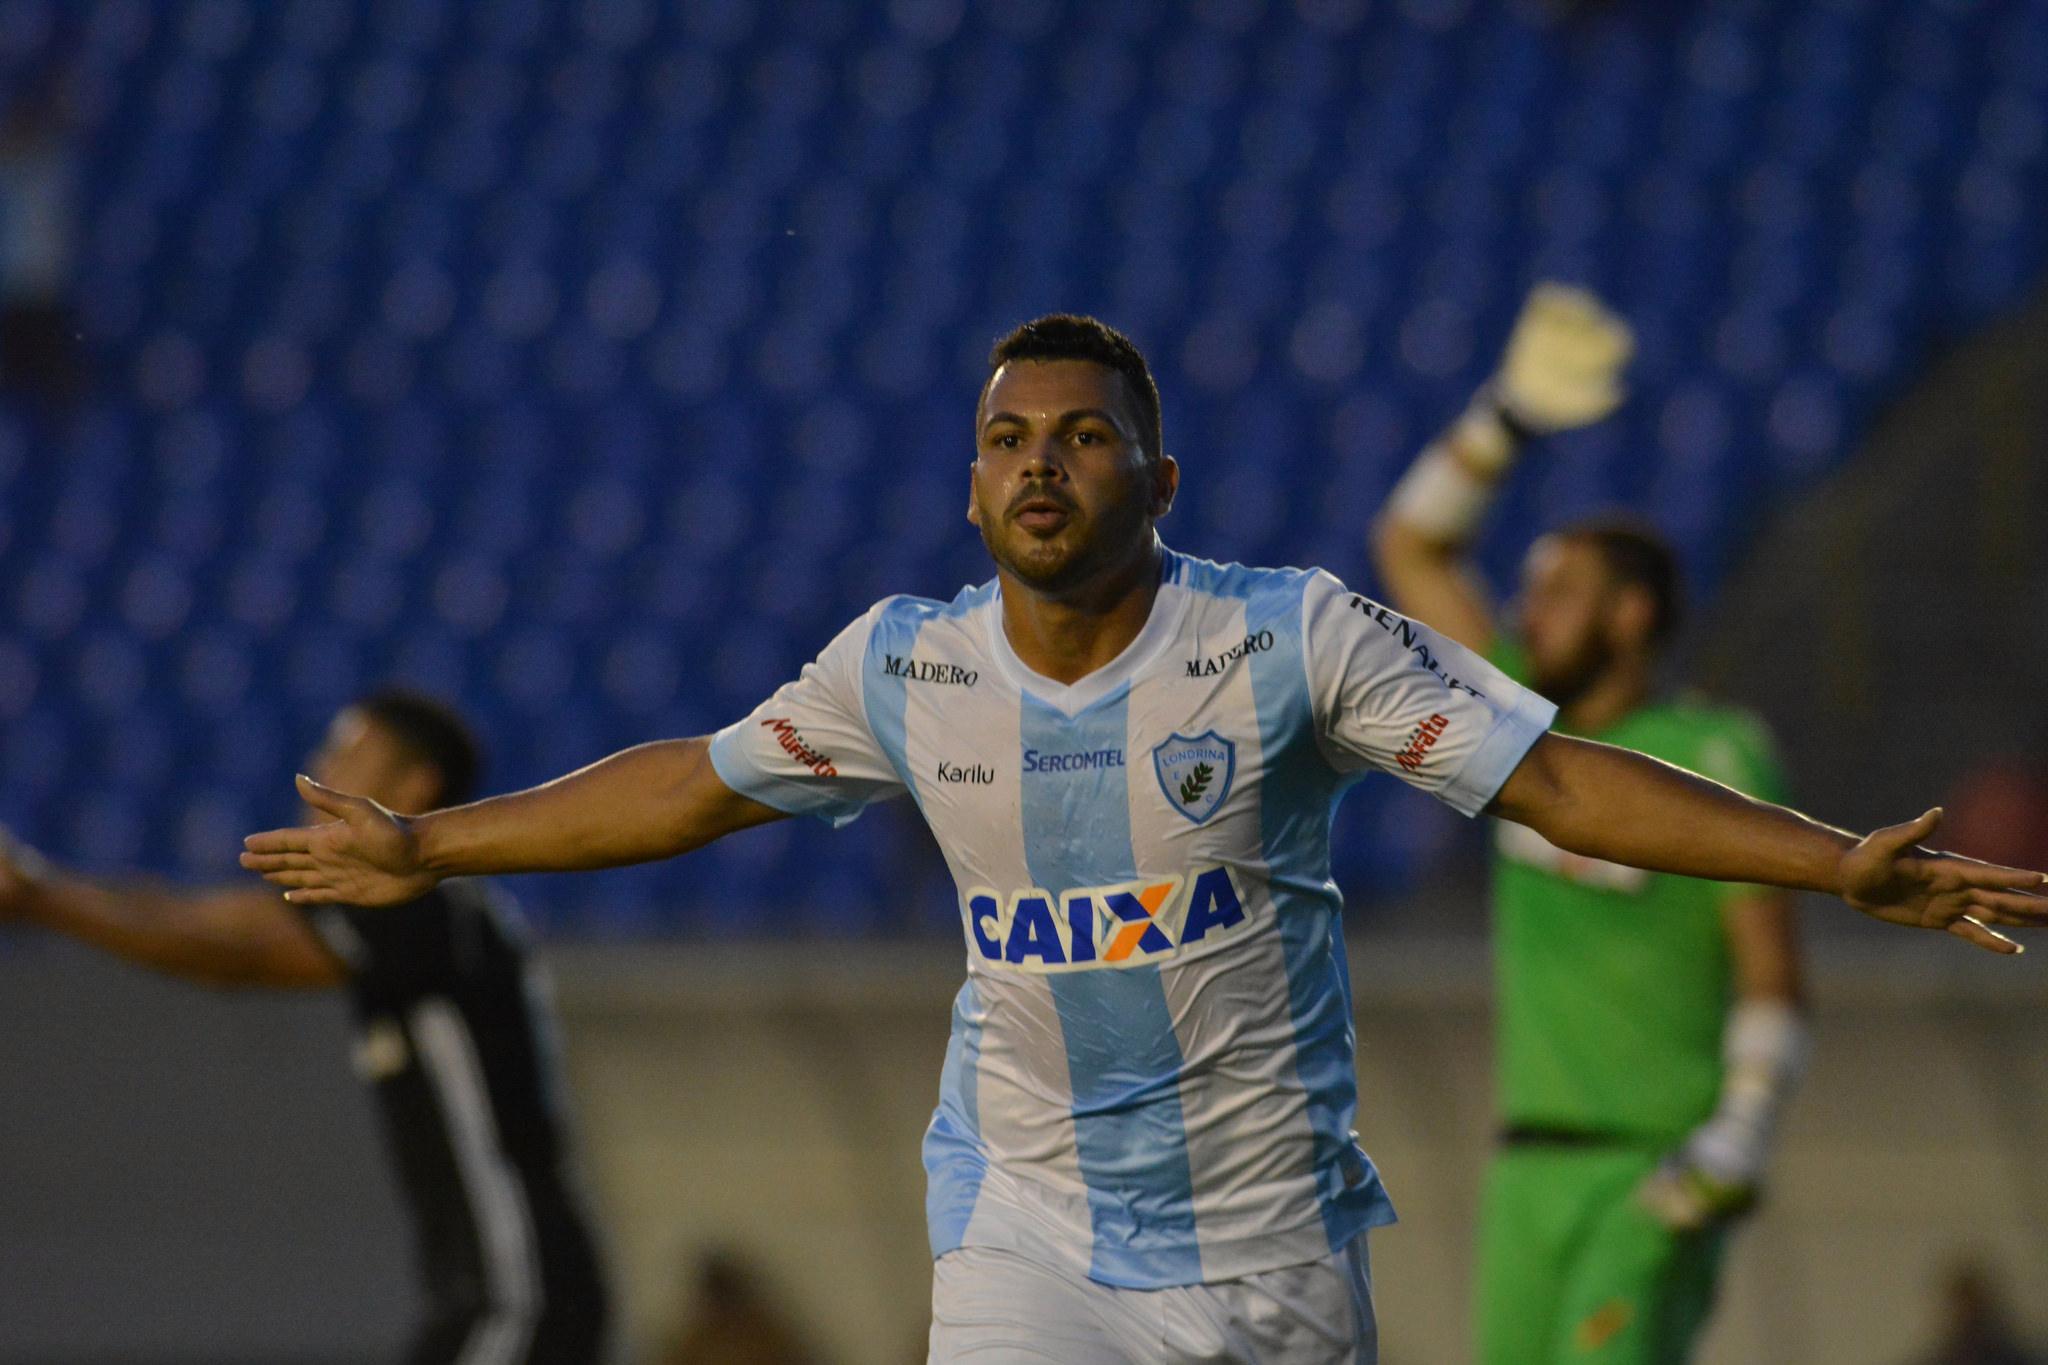 Carlos Henrique Foto Gustavo Oliveira Londrina Esporte Clube